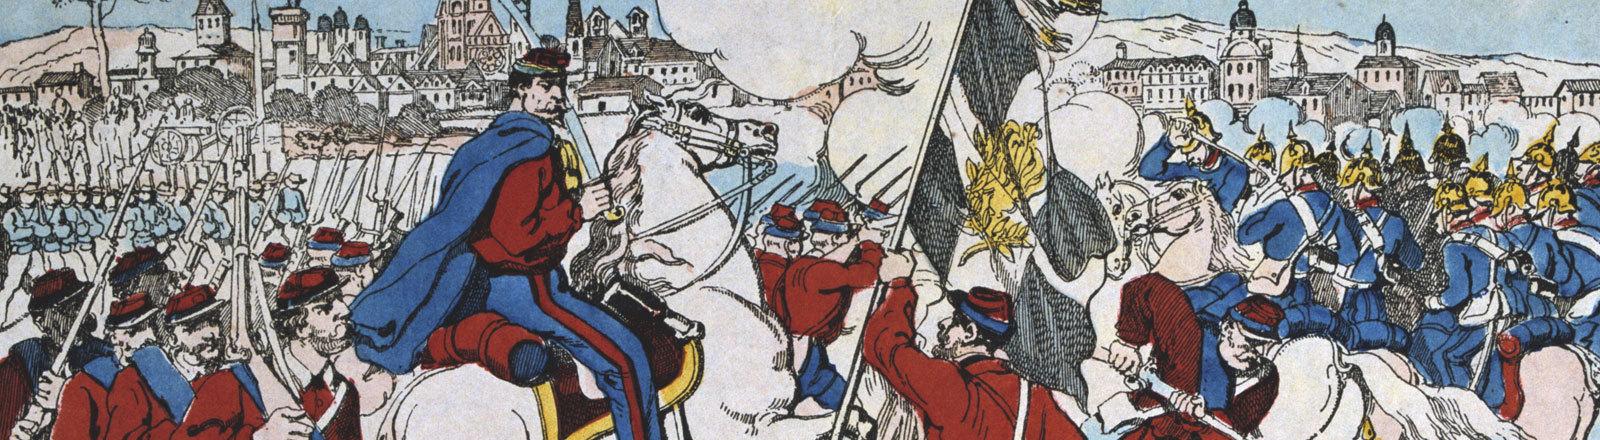 Guiseppe Garibaldis freiwilligen Soldaten.